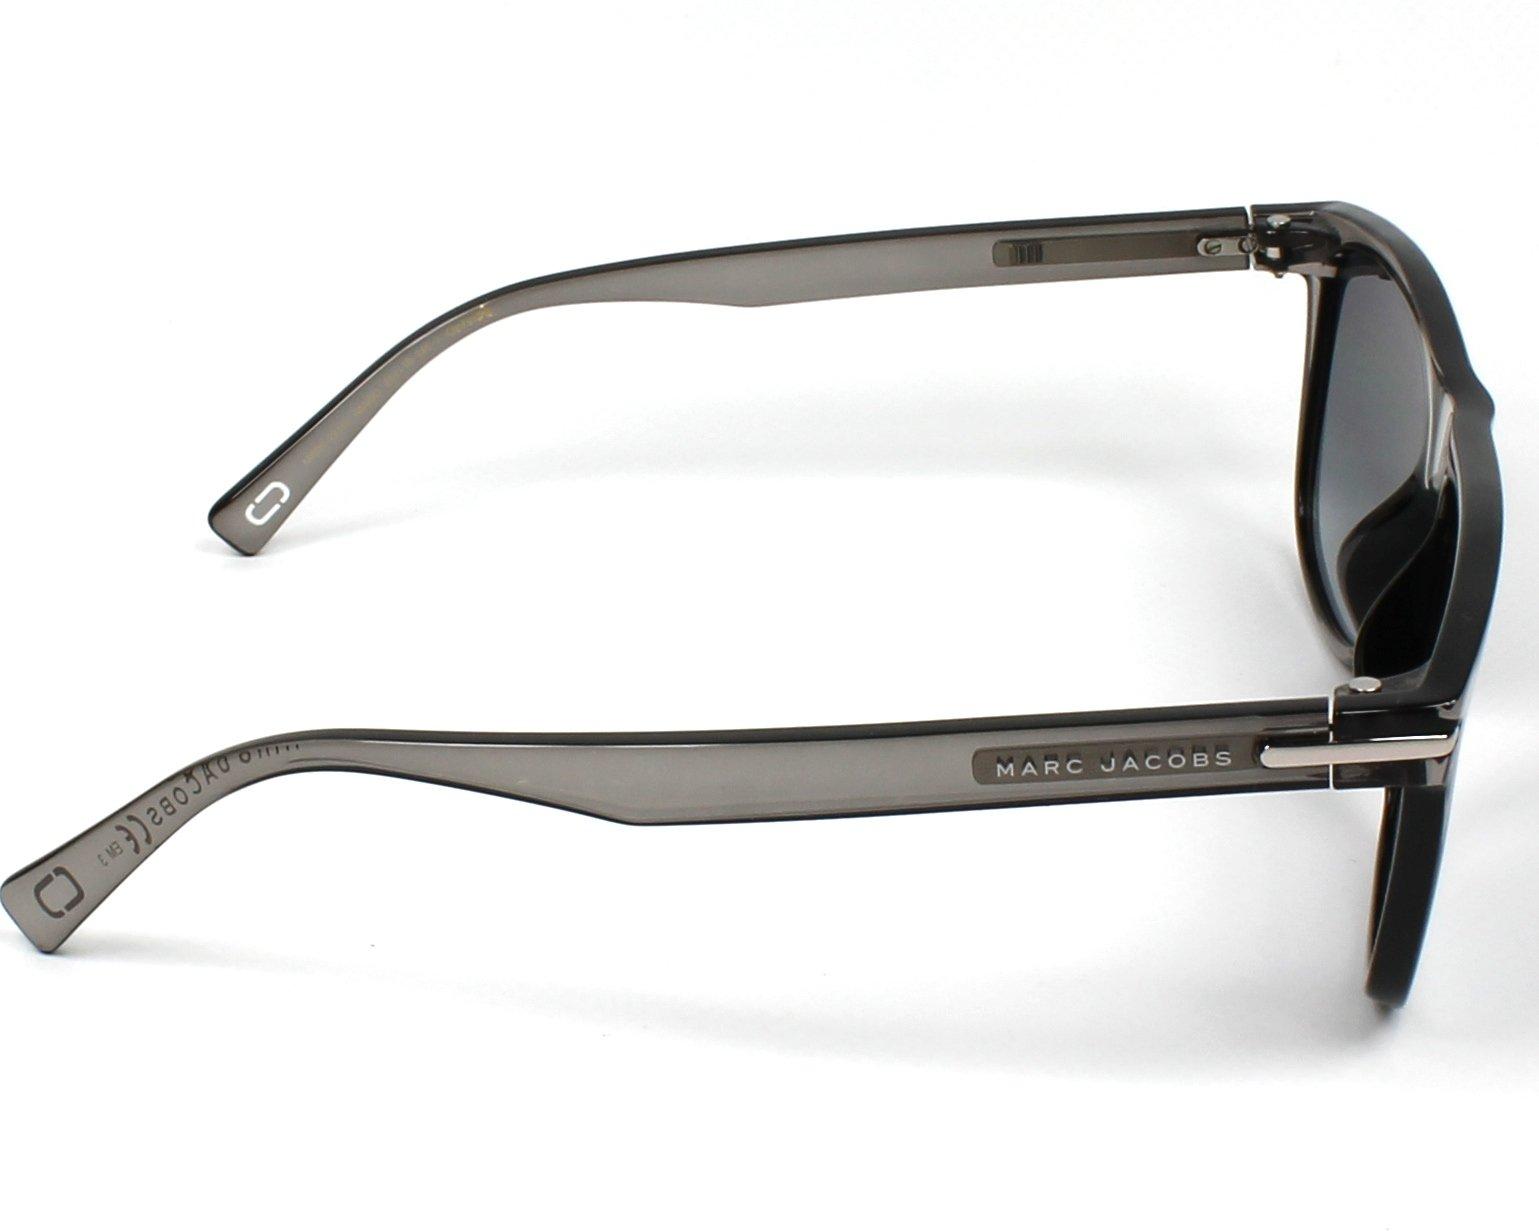 Sunglasses Marc Jacobs MARC-221-S R6S 9O 55-18 Grey side 40ef8b6f84a2